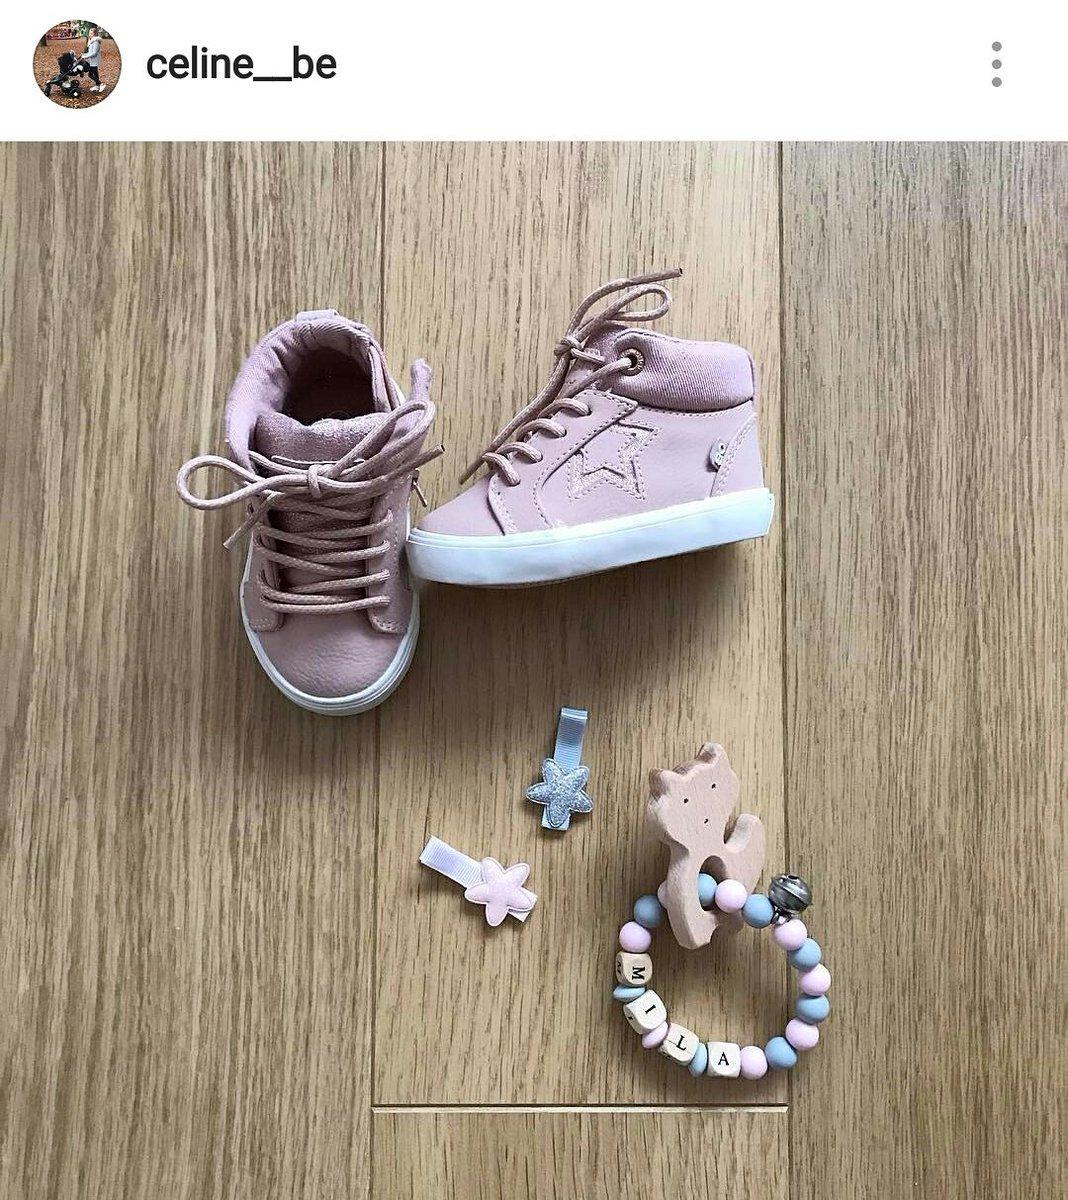 Le #babylook du jour de la petite Mila  #hochet #creation #handmade #faitmain #madeinfrance #rattle #mompreneur #baby #renard #fox #bébé<br>http://pic.twitter.com/LrHWlILF1r